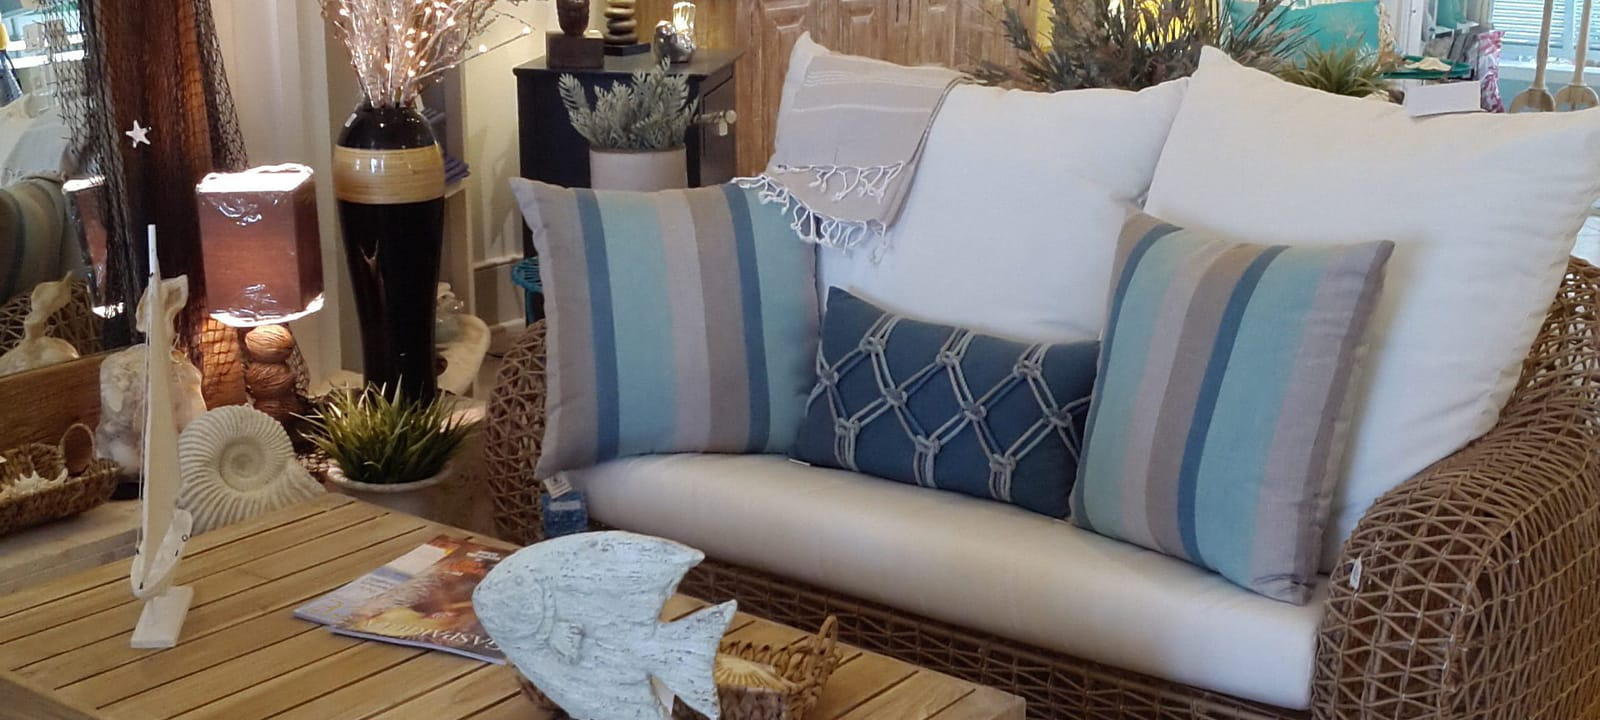 Southern Design Living | Southwest Florida Furniture Store